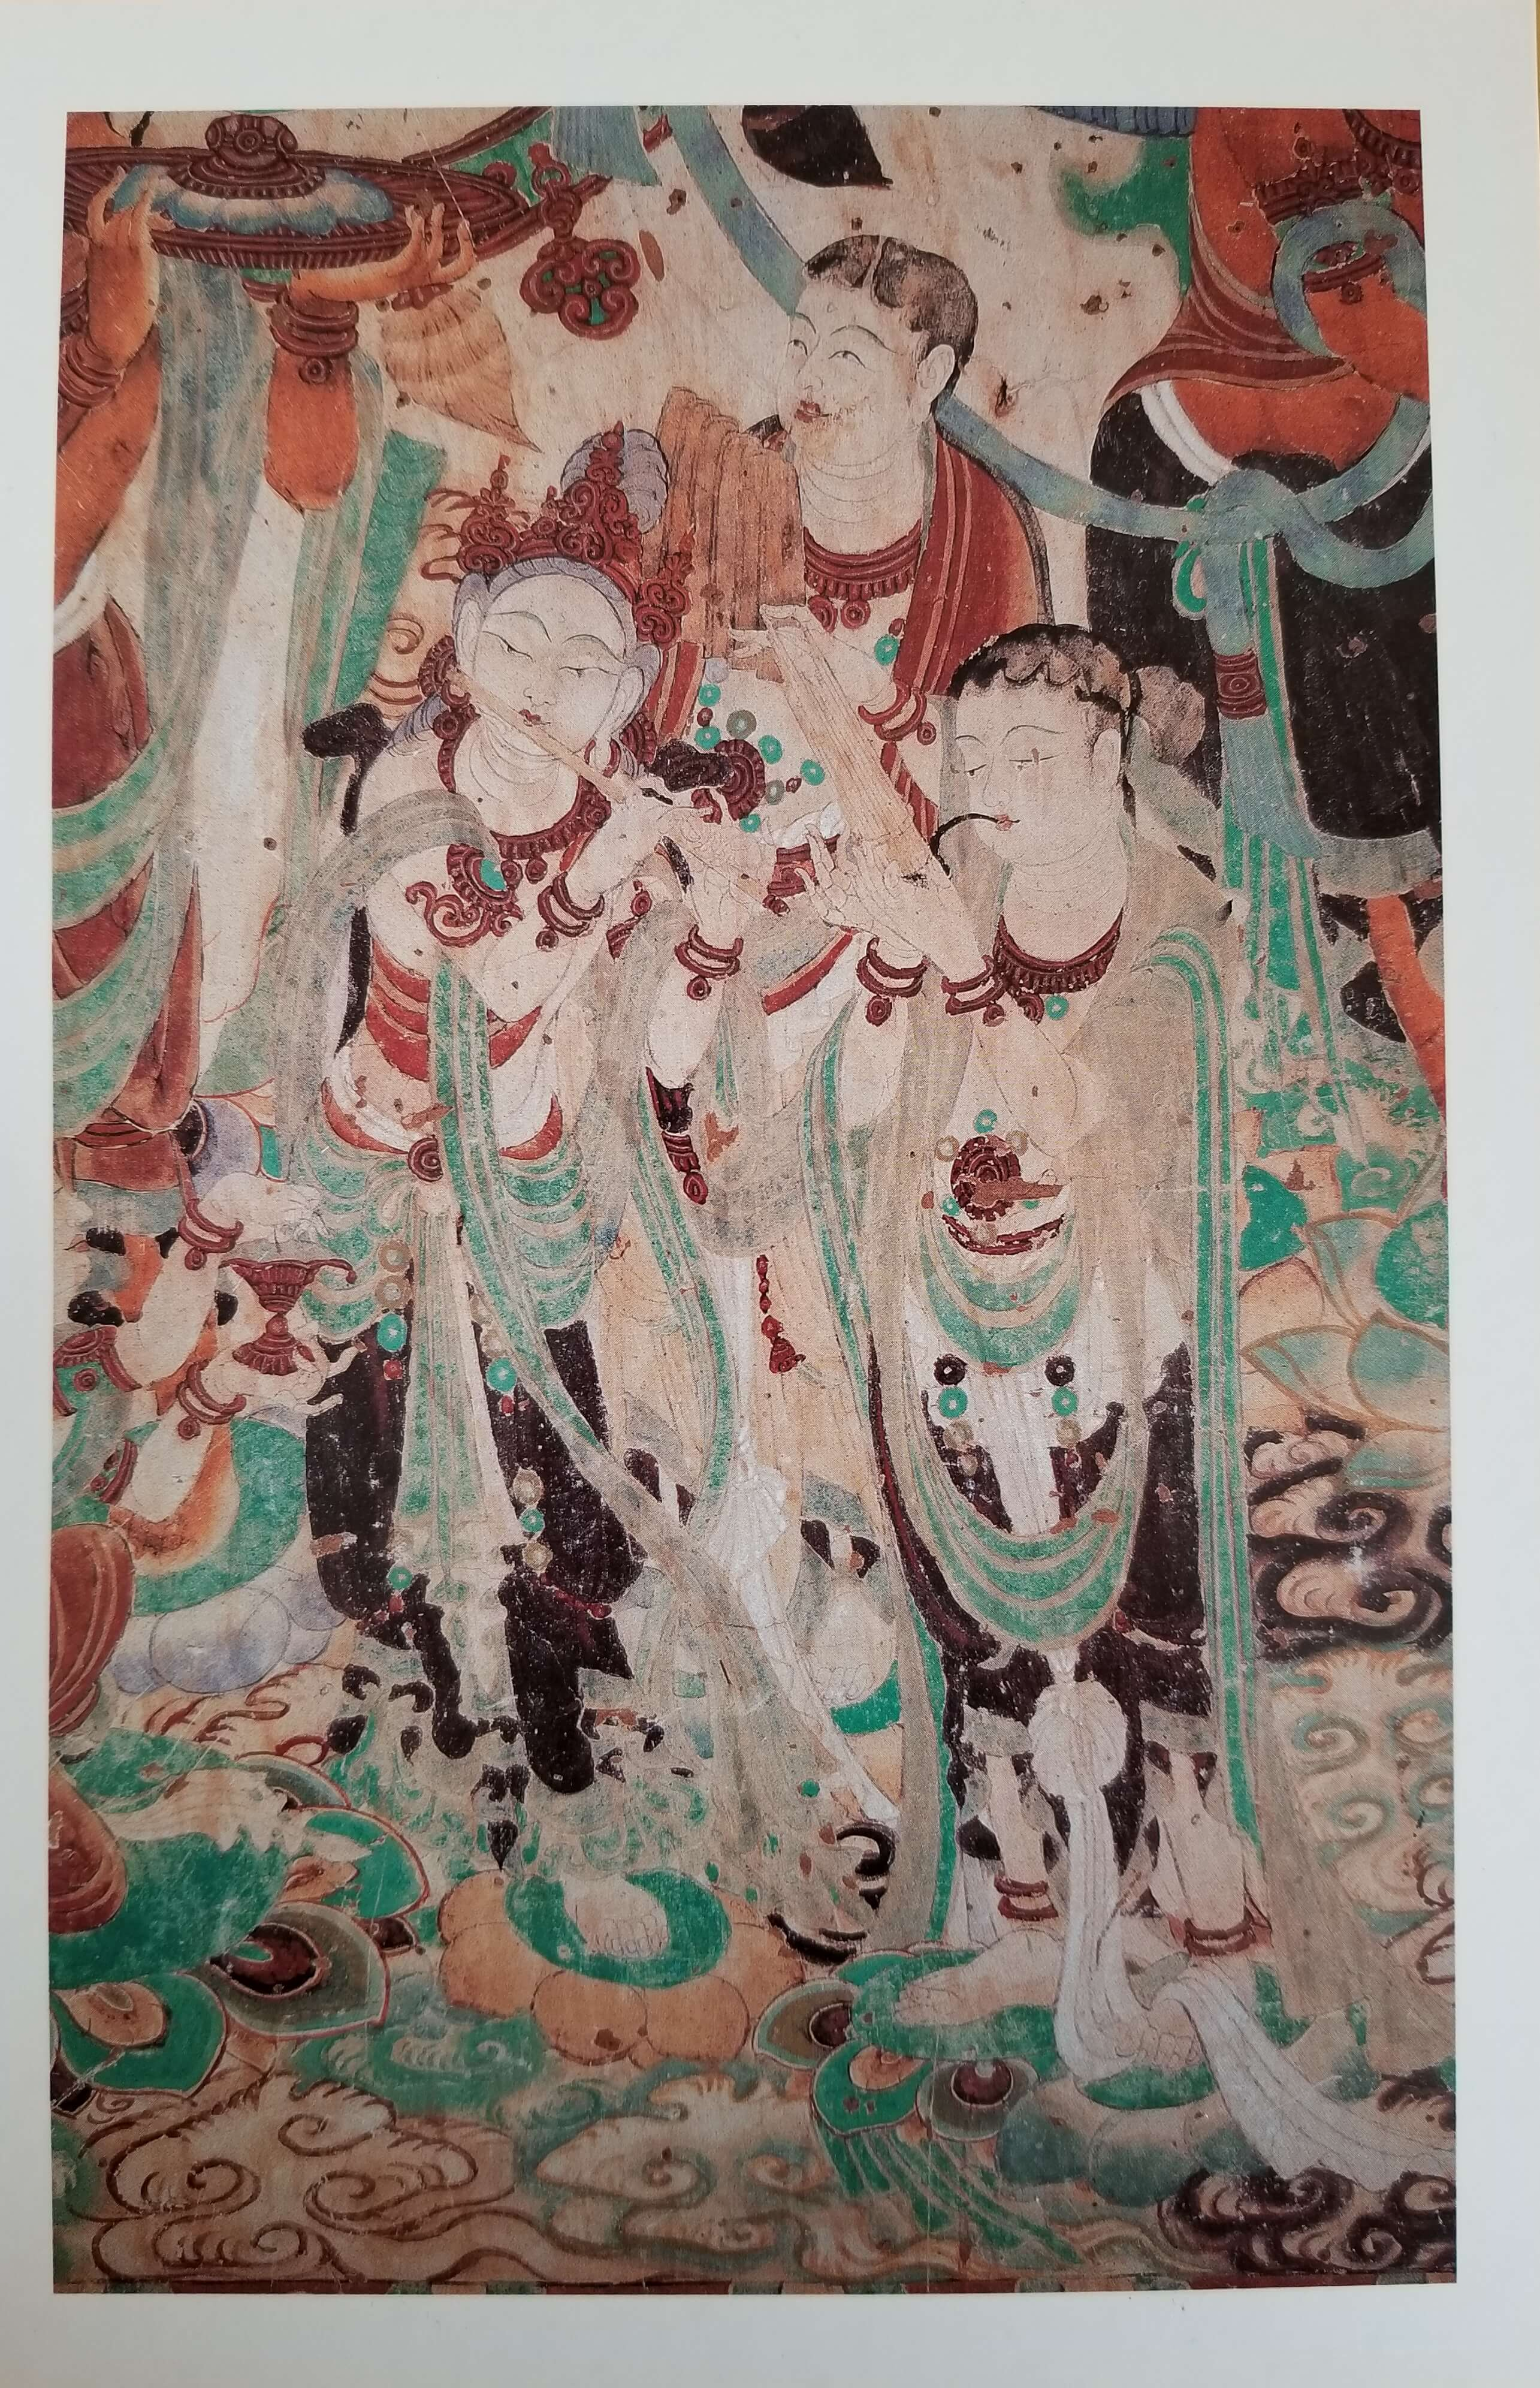 Mogao Caves Tang Dynasty